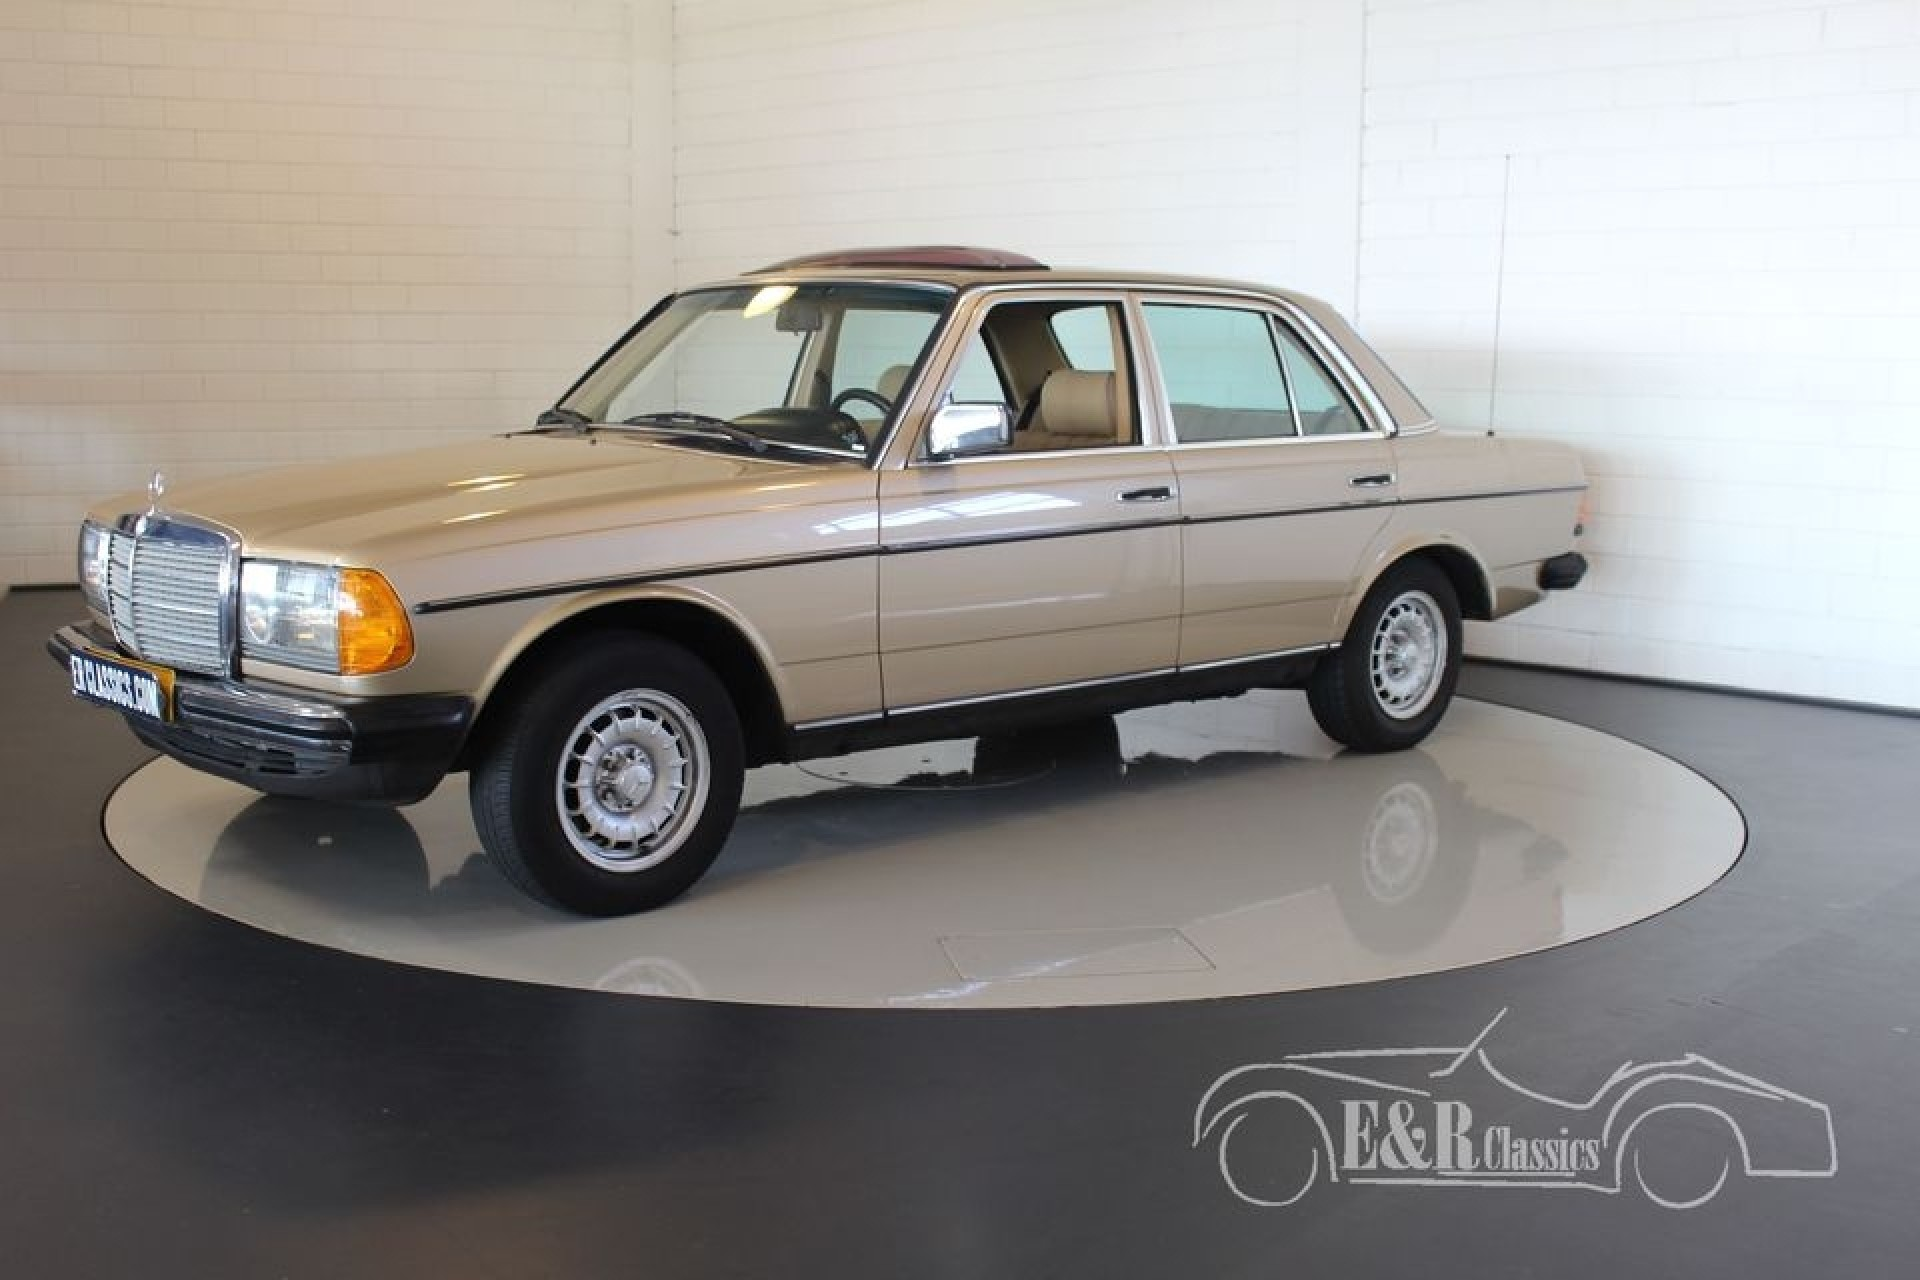 Mercedes benz 230e 1984 for sale at erclassics for Mercedes benz 230e